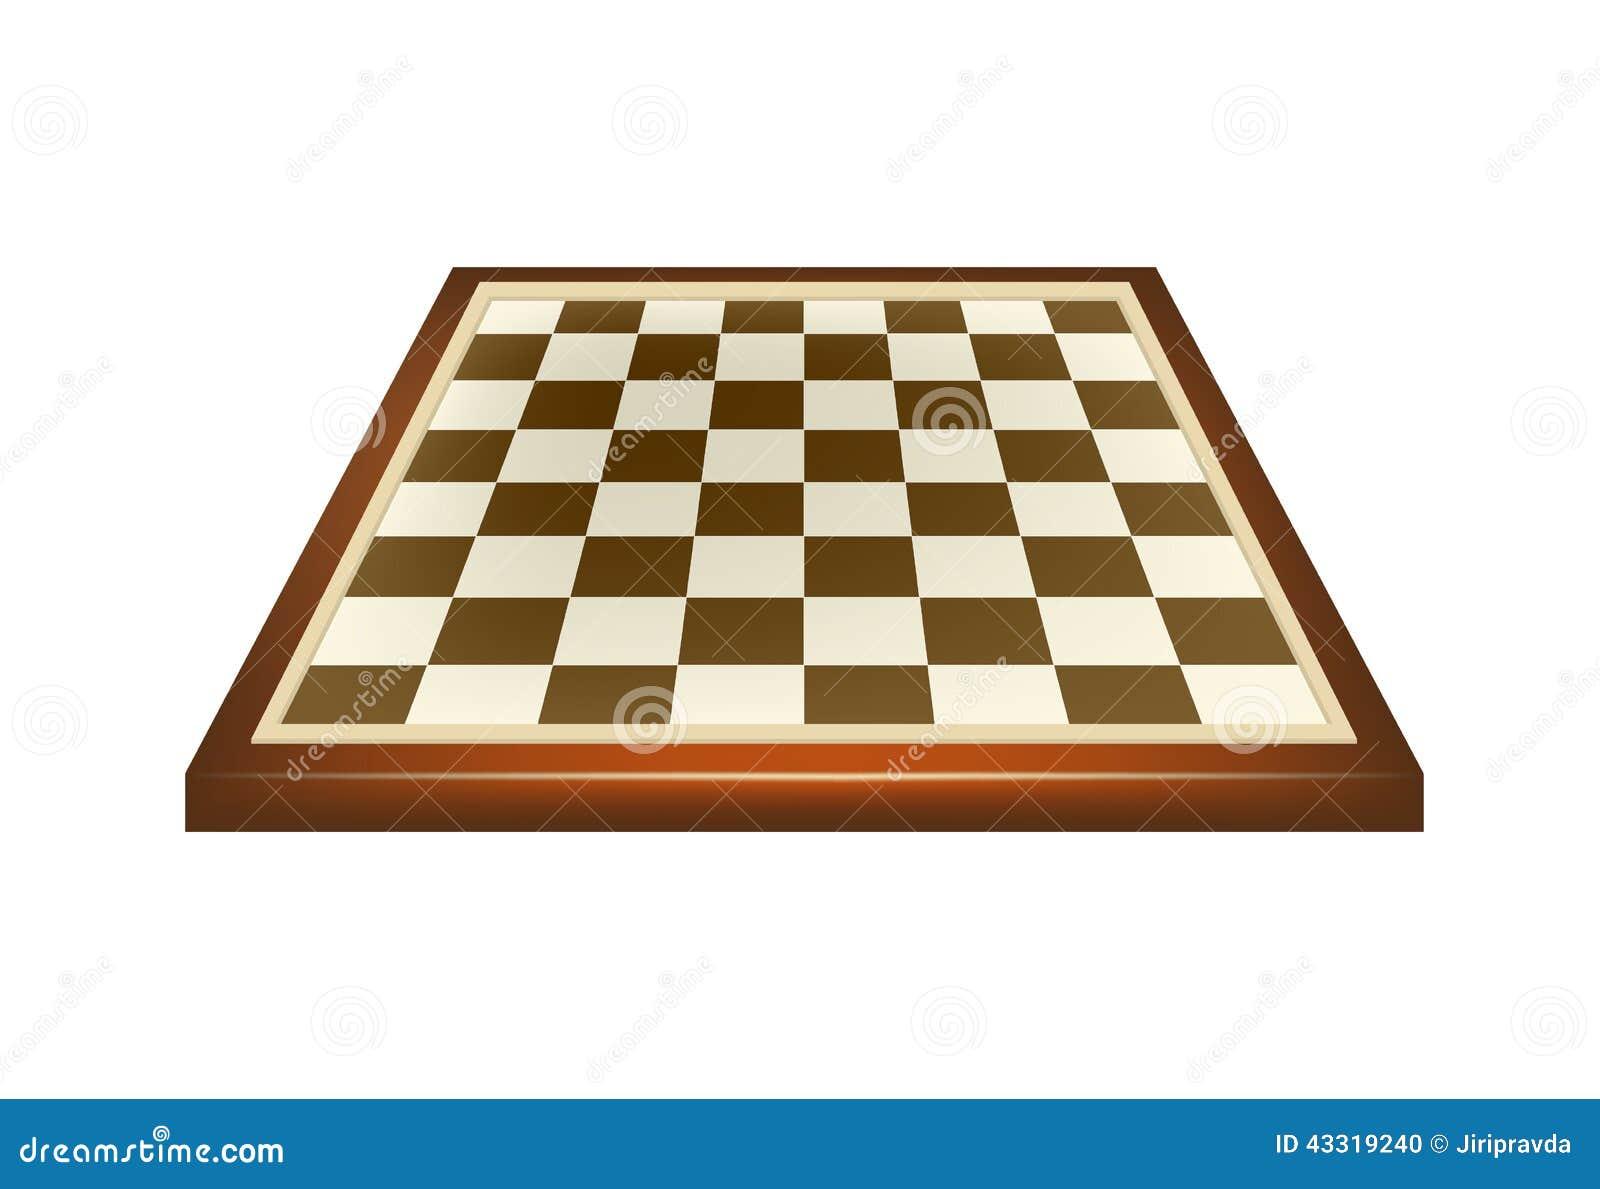 Empty chess board in brown design